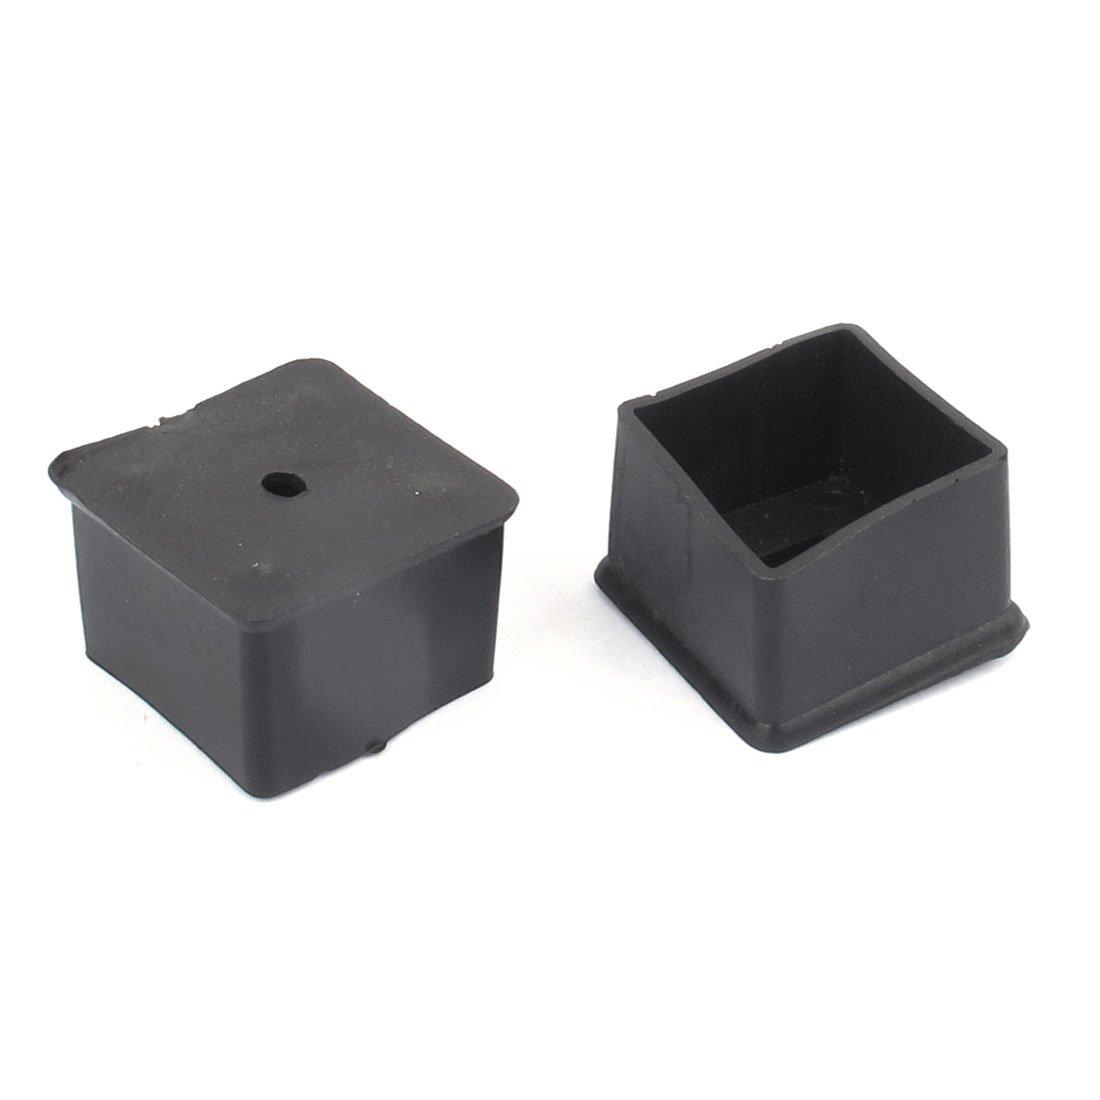 Sourcingmap Gummi Möbel Tisch Stuhl Fuß Bein Gap Tip Pad Cover Protector 2